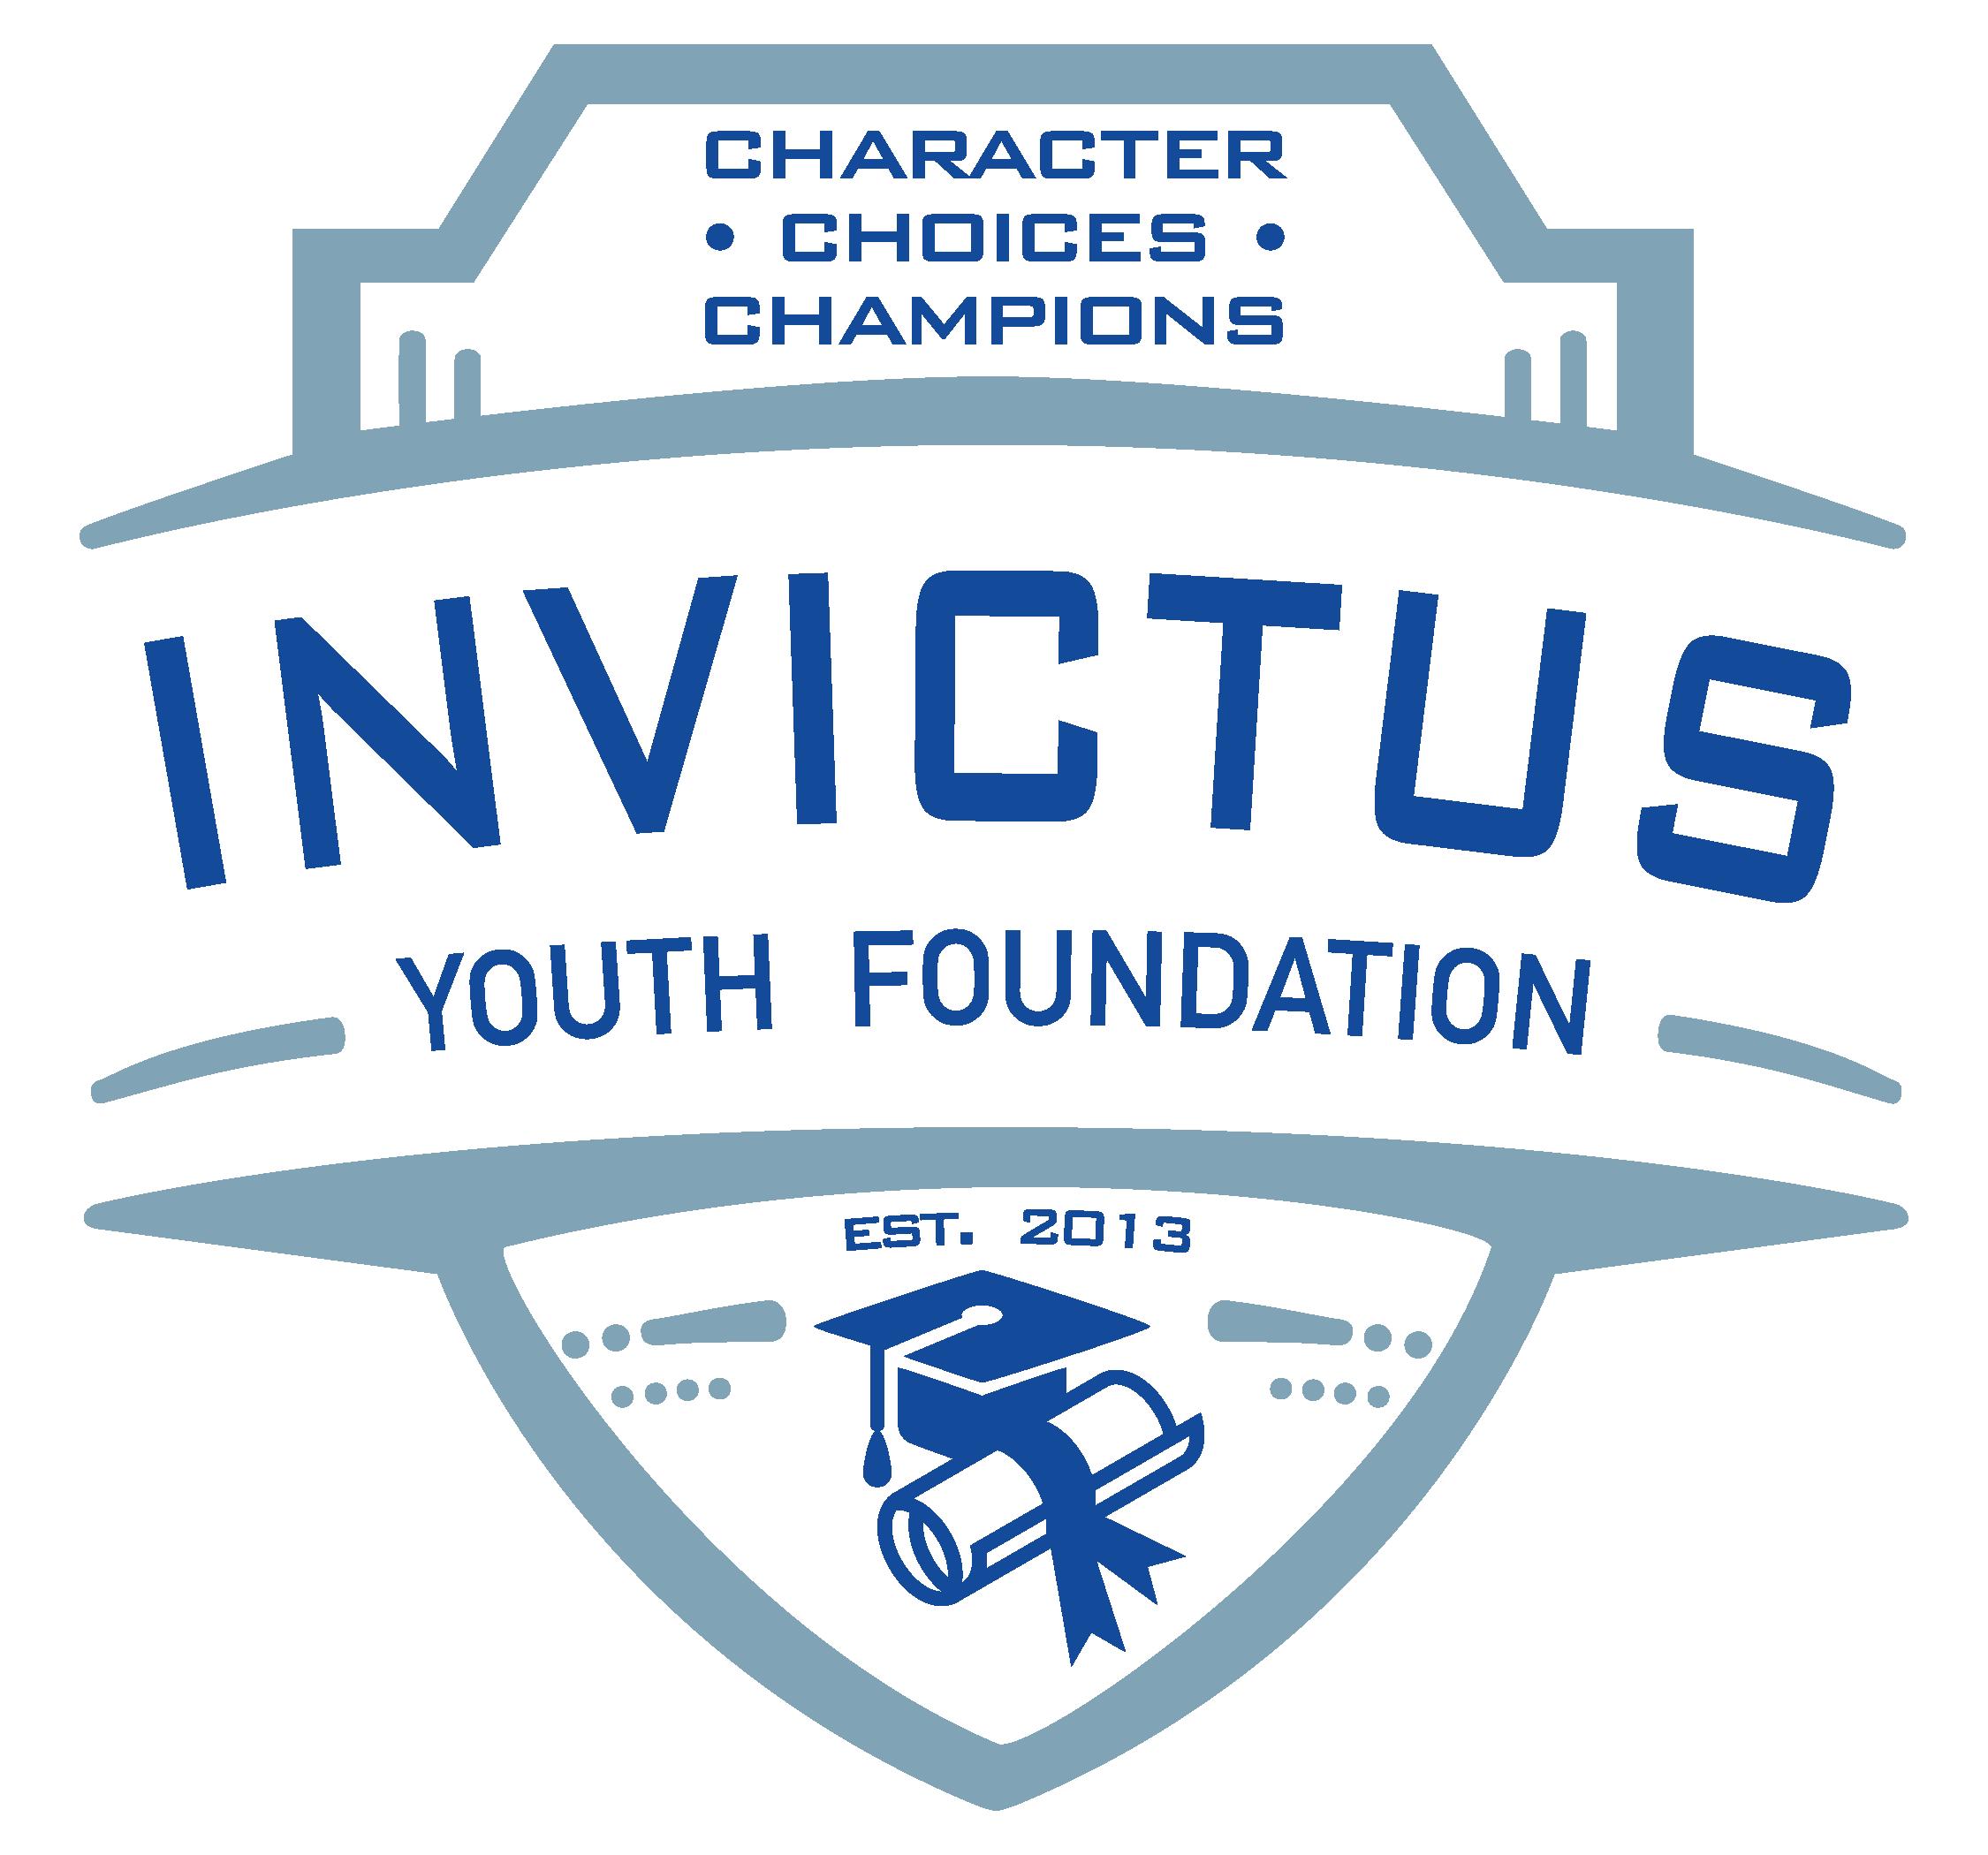 Invictus Youth Foundation